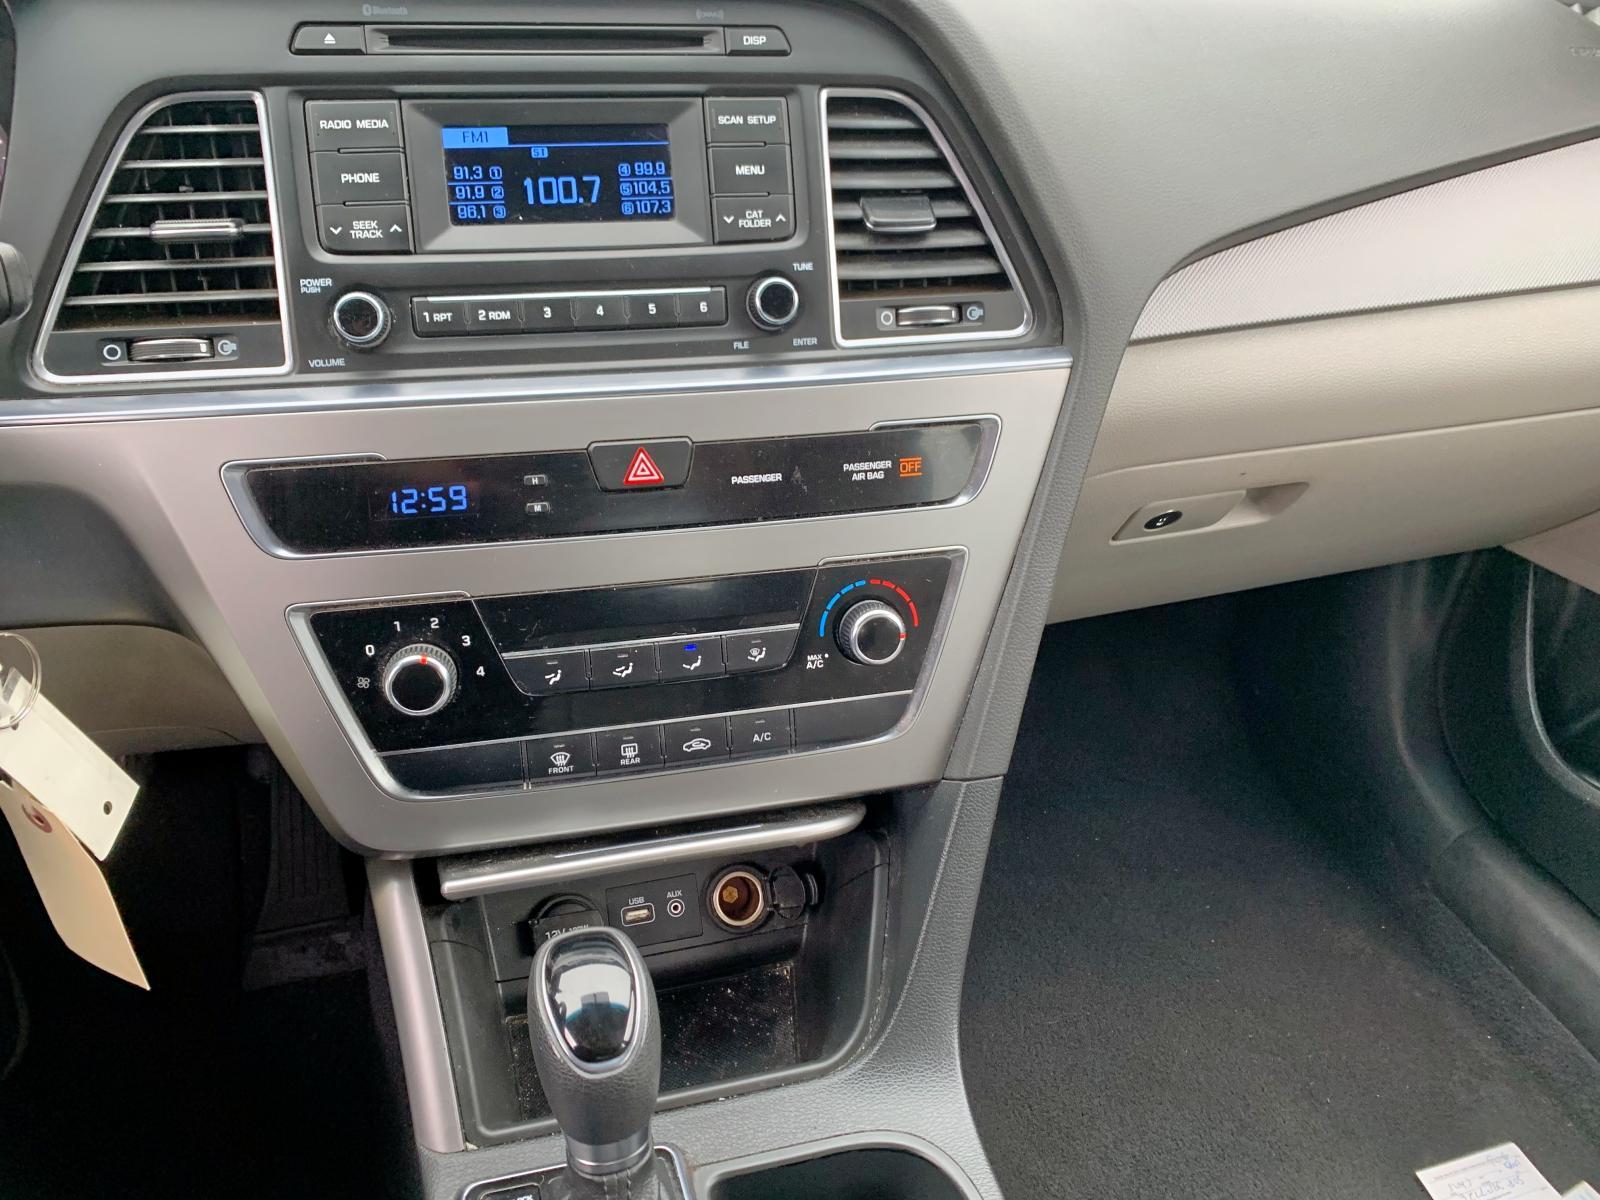 5NPE24AF8FH201473 - 2015 Hyundai Sonata Se 2.4L front view